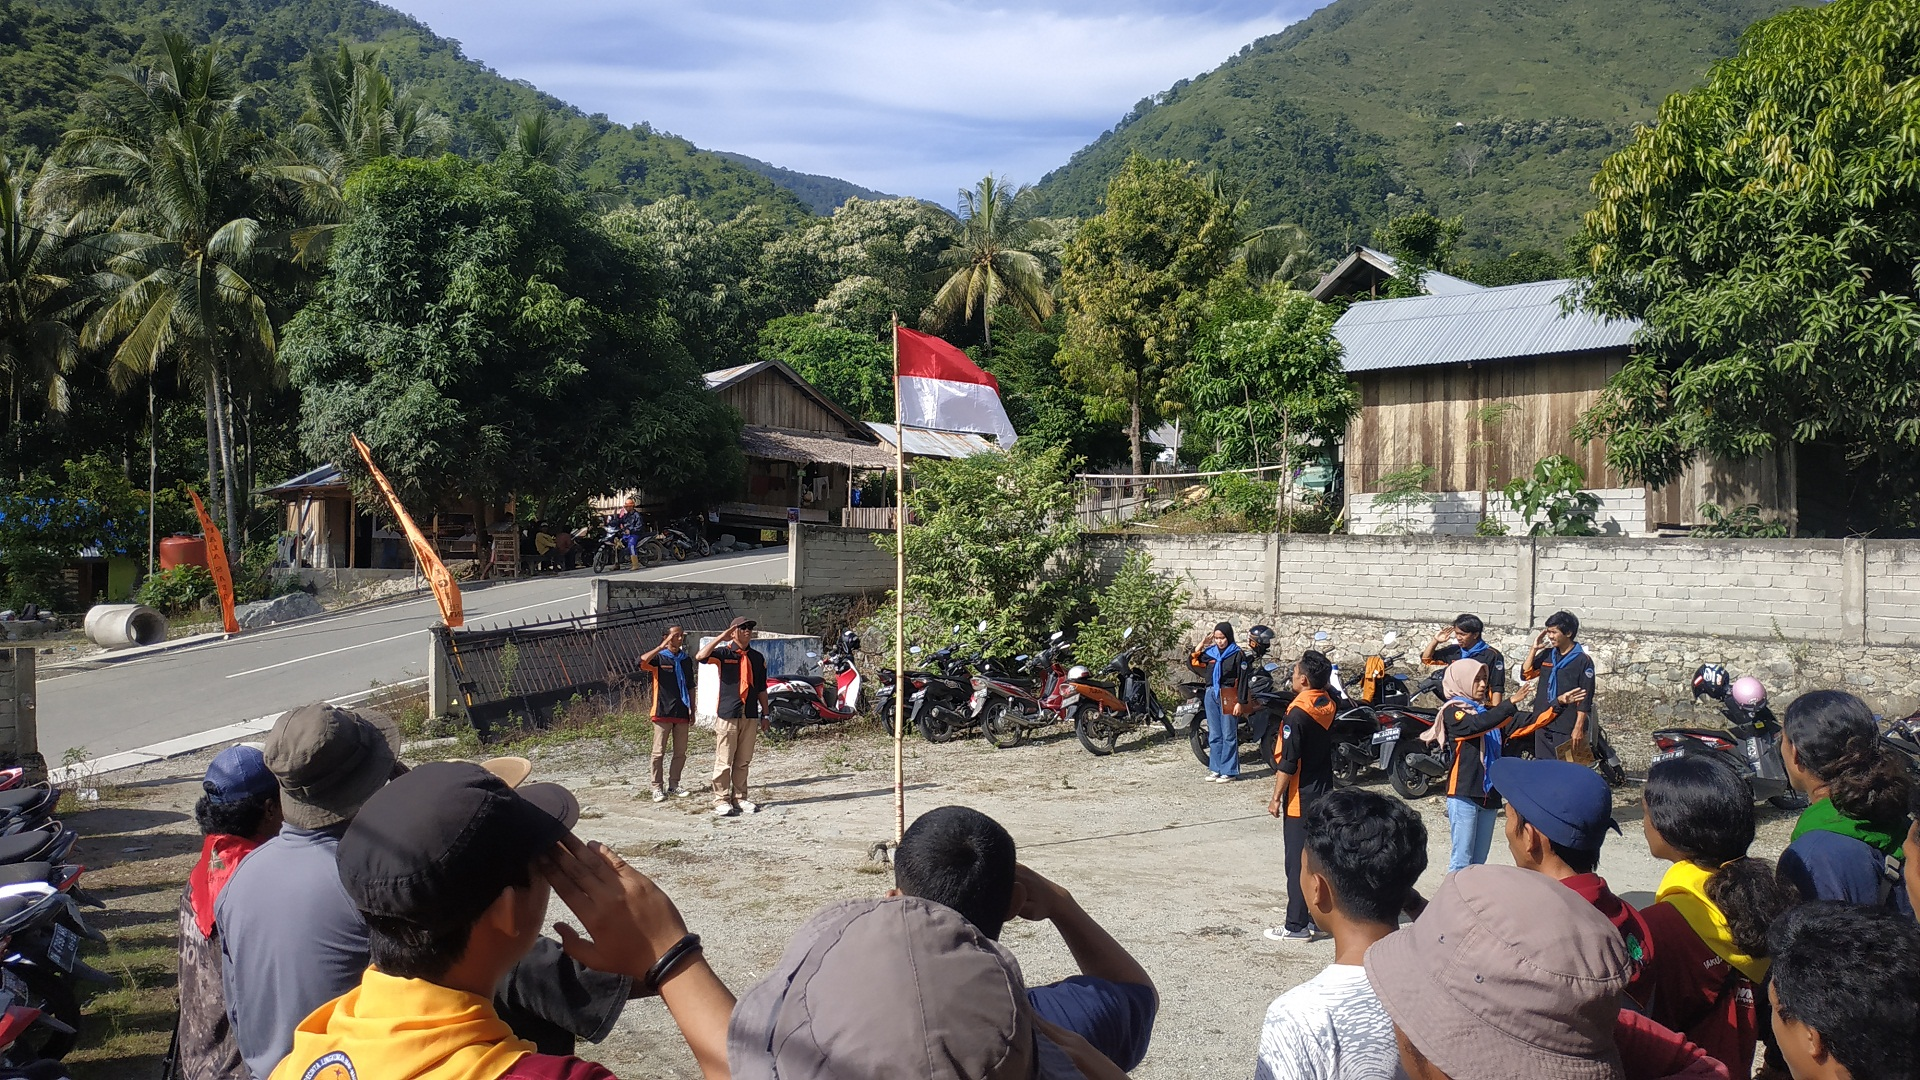 Jalur Pendakian Gunung Gawalise Via Salena Wana Resmi Di Buka Untuk Umum Wartapala Indonesia